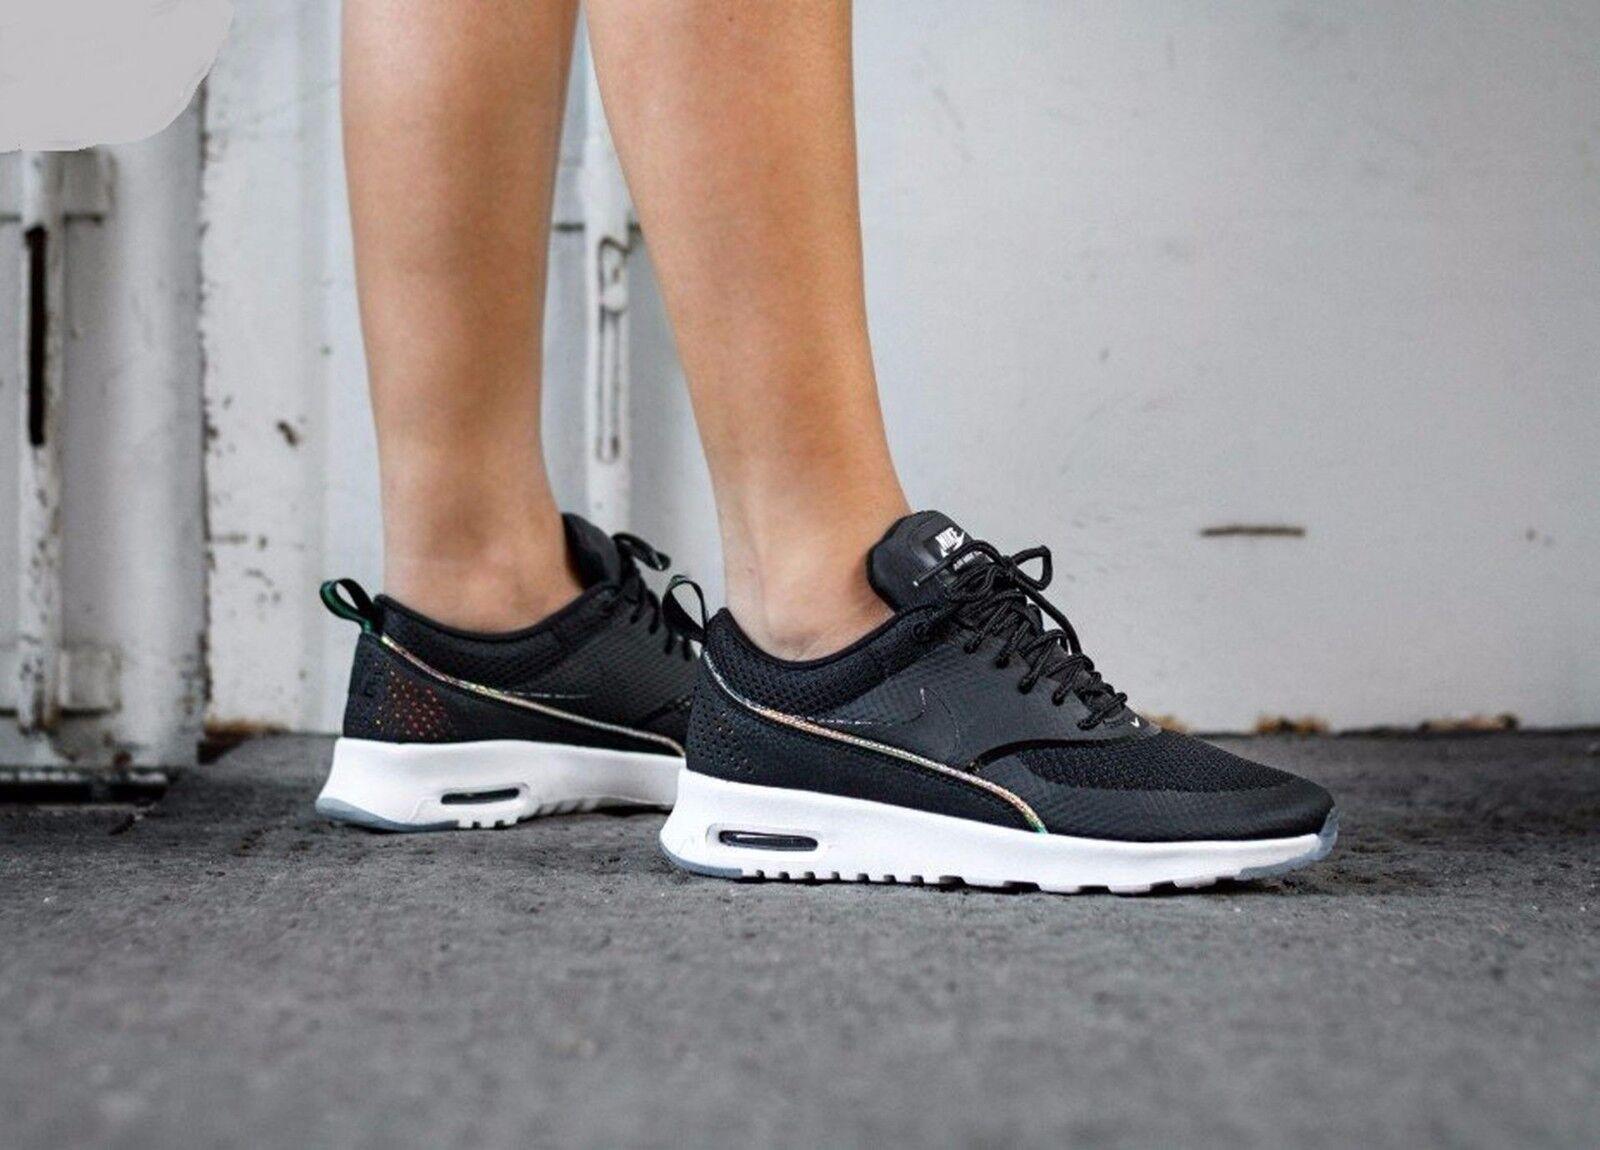 Nike Air Max Thea PRM Premium Black Black-bluee Tint 616723-014 Wmn Sz 8